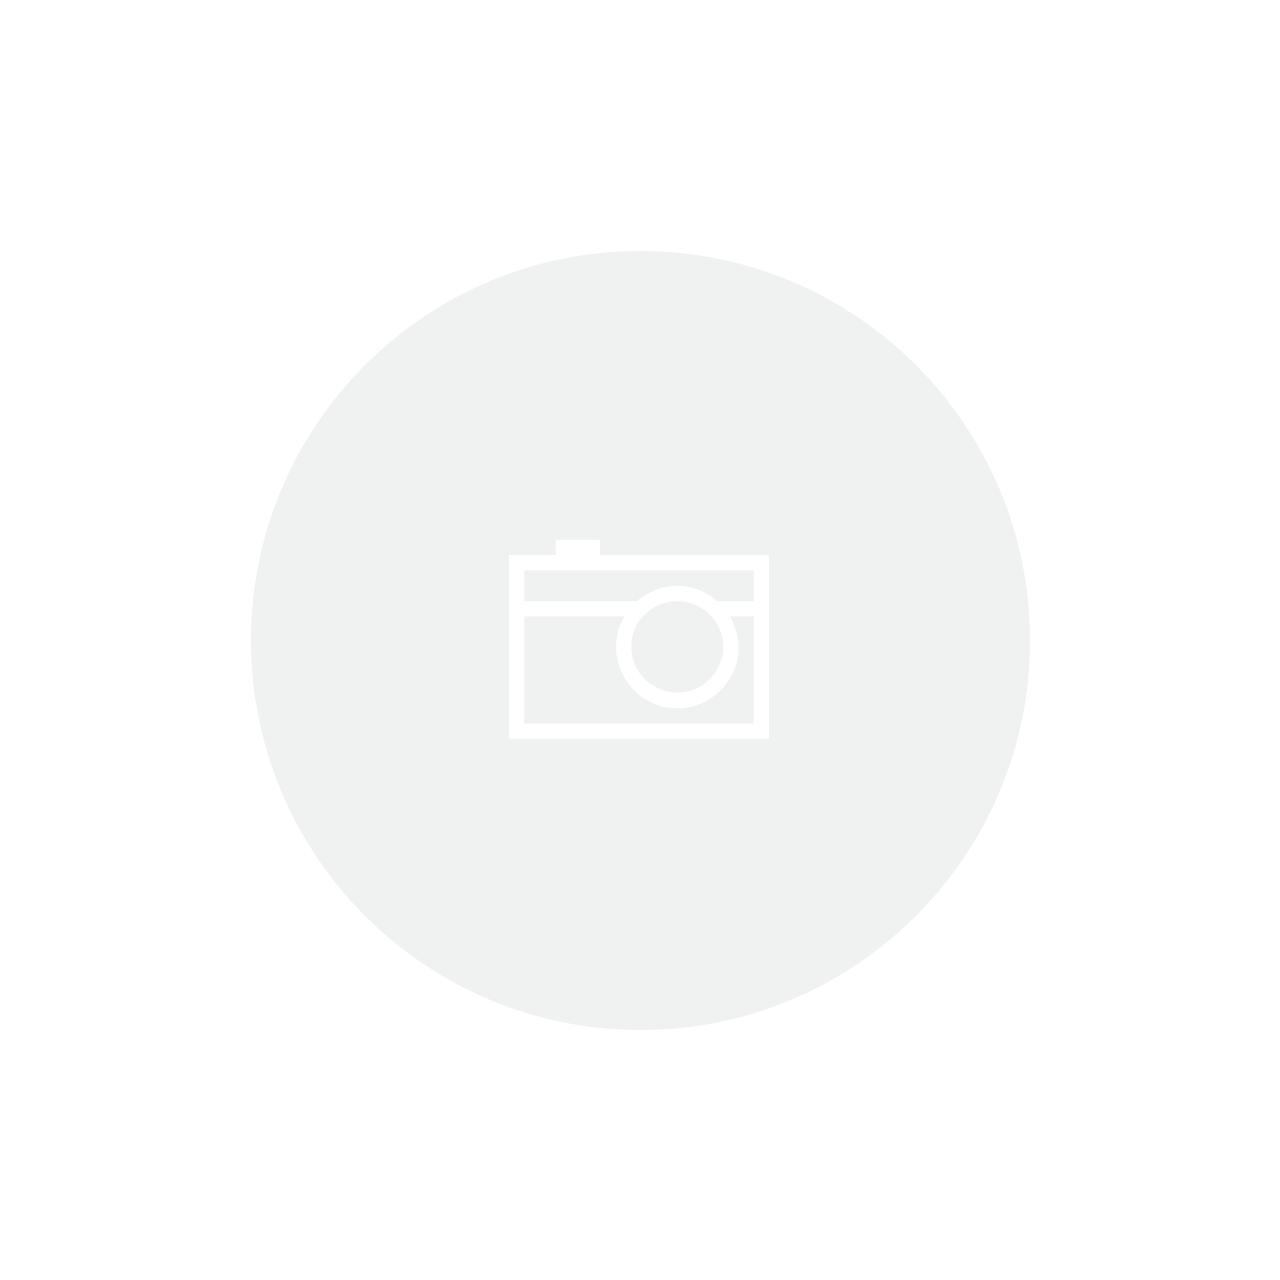 Papel Artesanal Indiano - Ref. 71